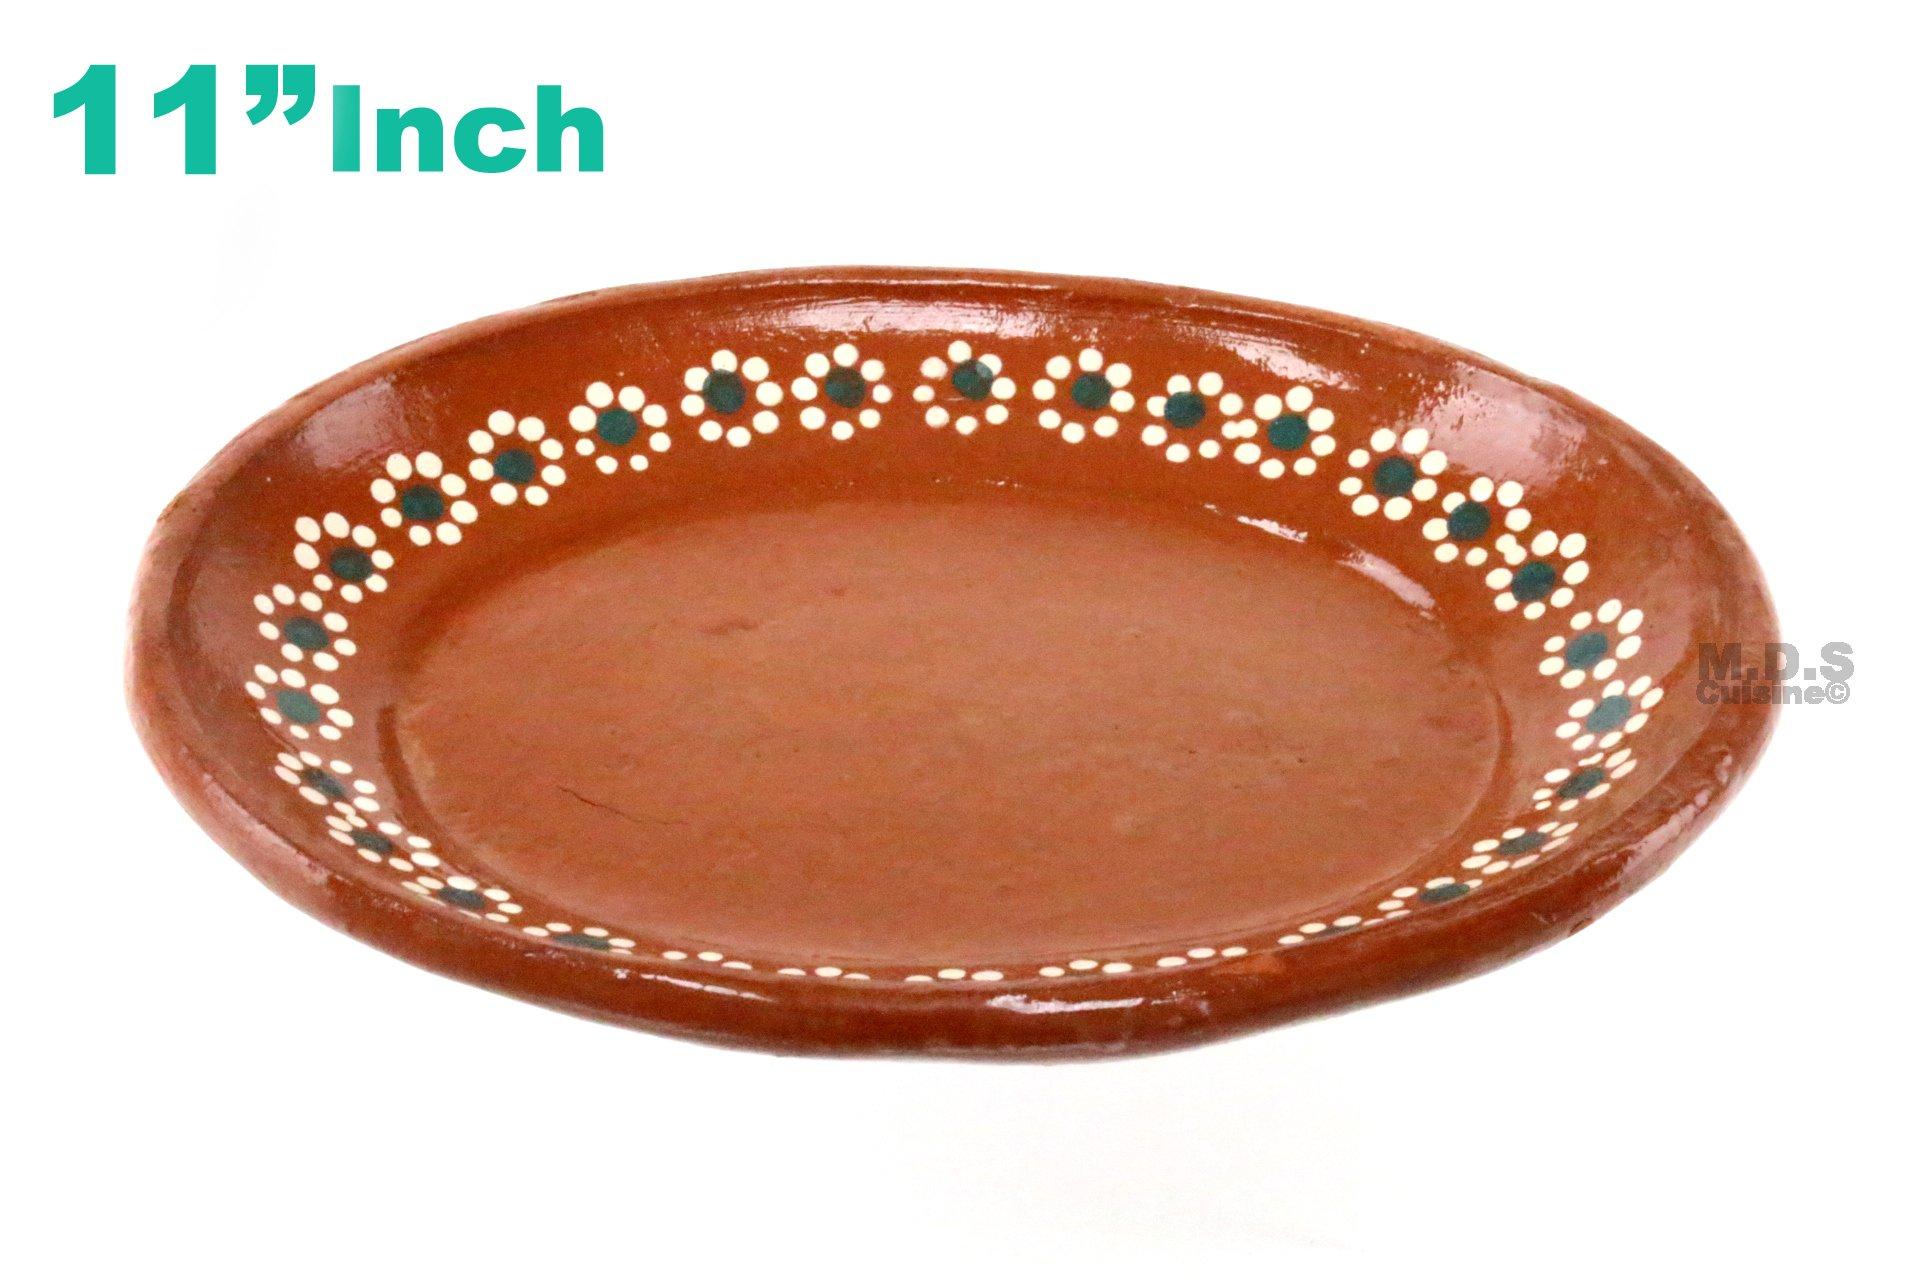 "Plato De Barro 11"" inch Para Mole Mexican Plate Traditional Clay Lead Free Artisan Artezania"